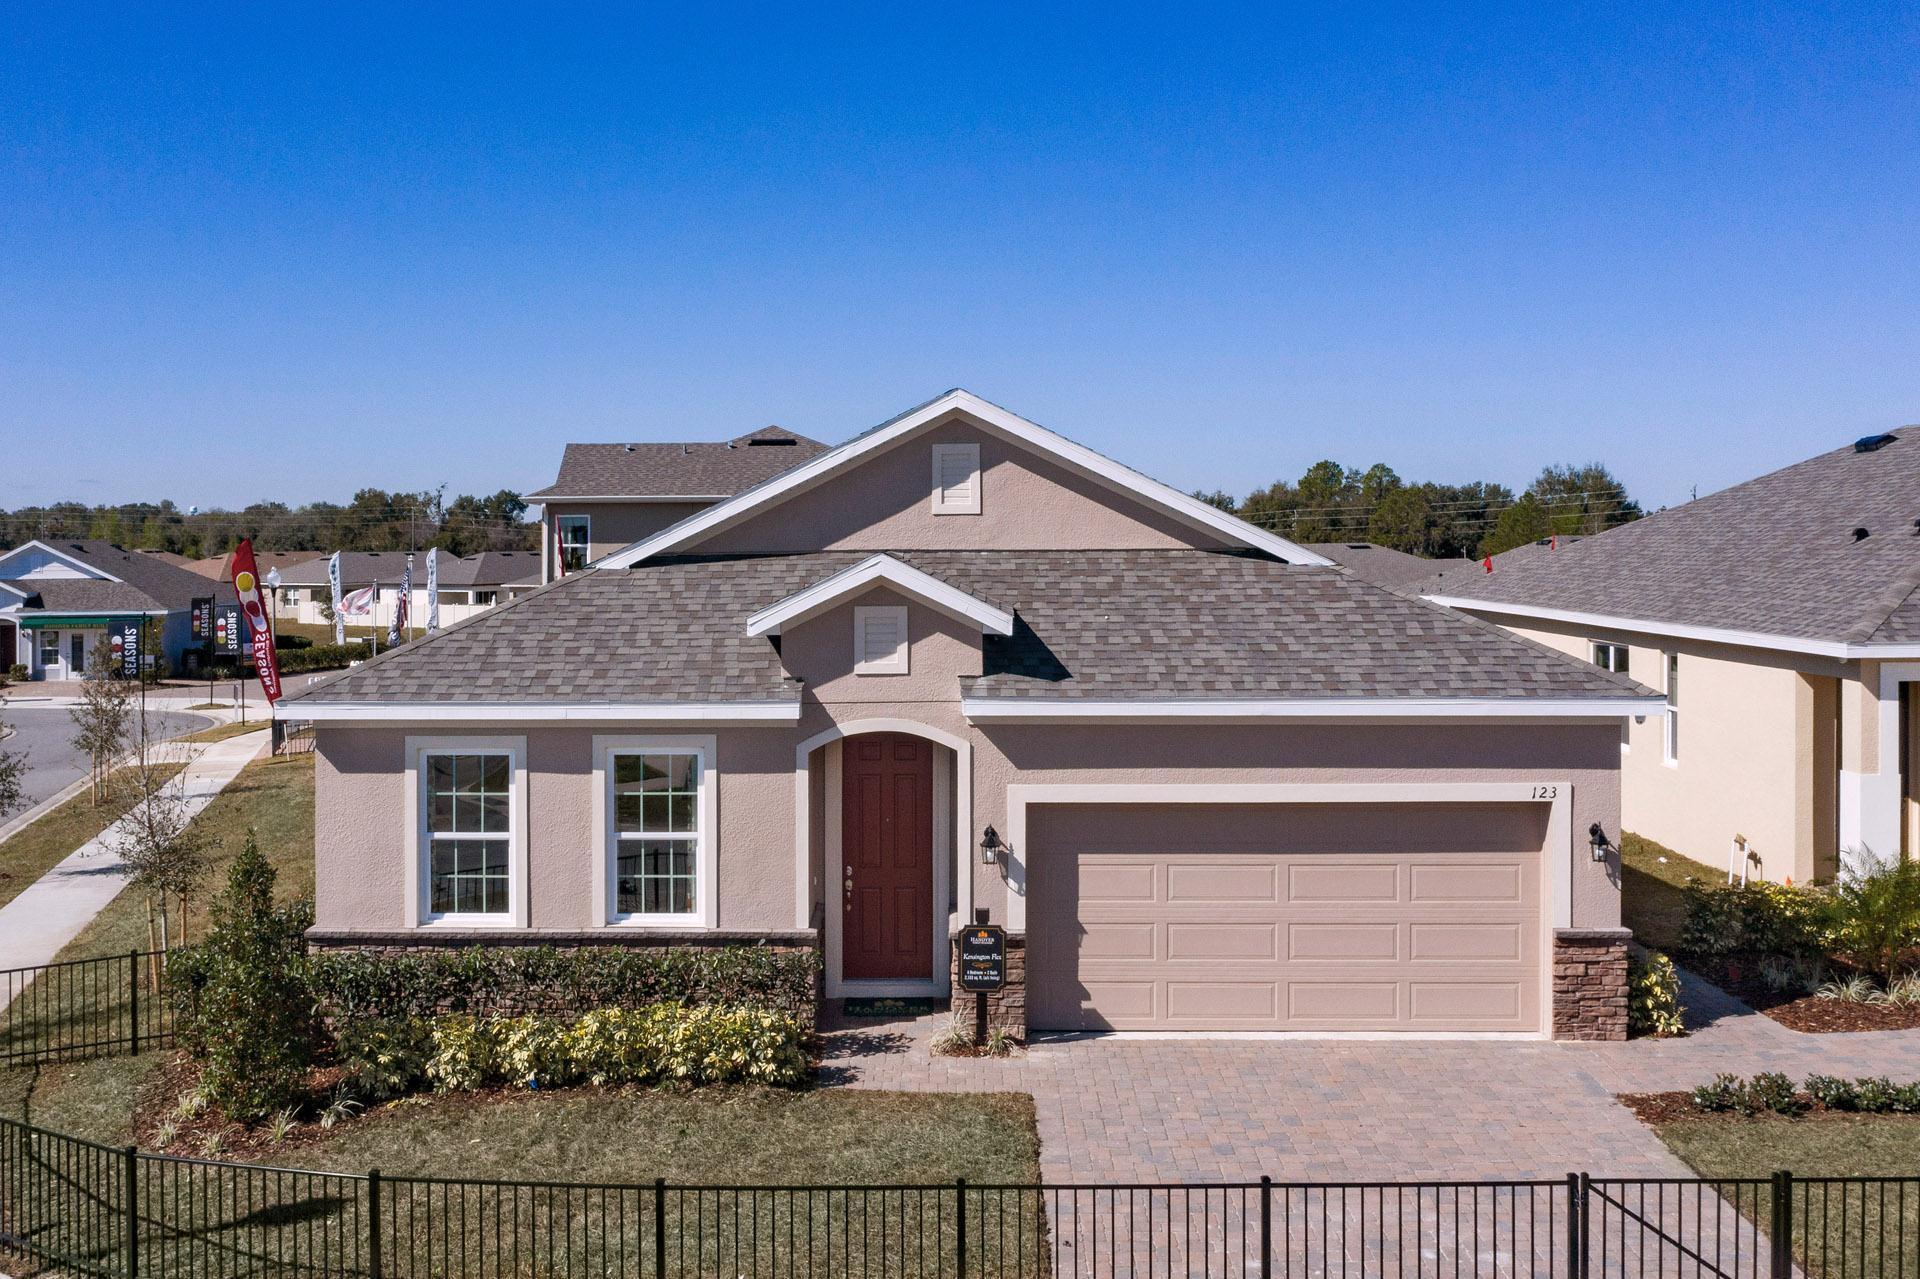 Model Home Front Elevation:Kensington Flex  |  Hanover Family Builders